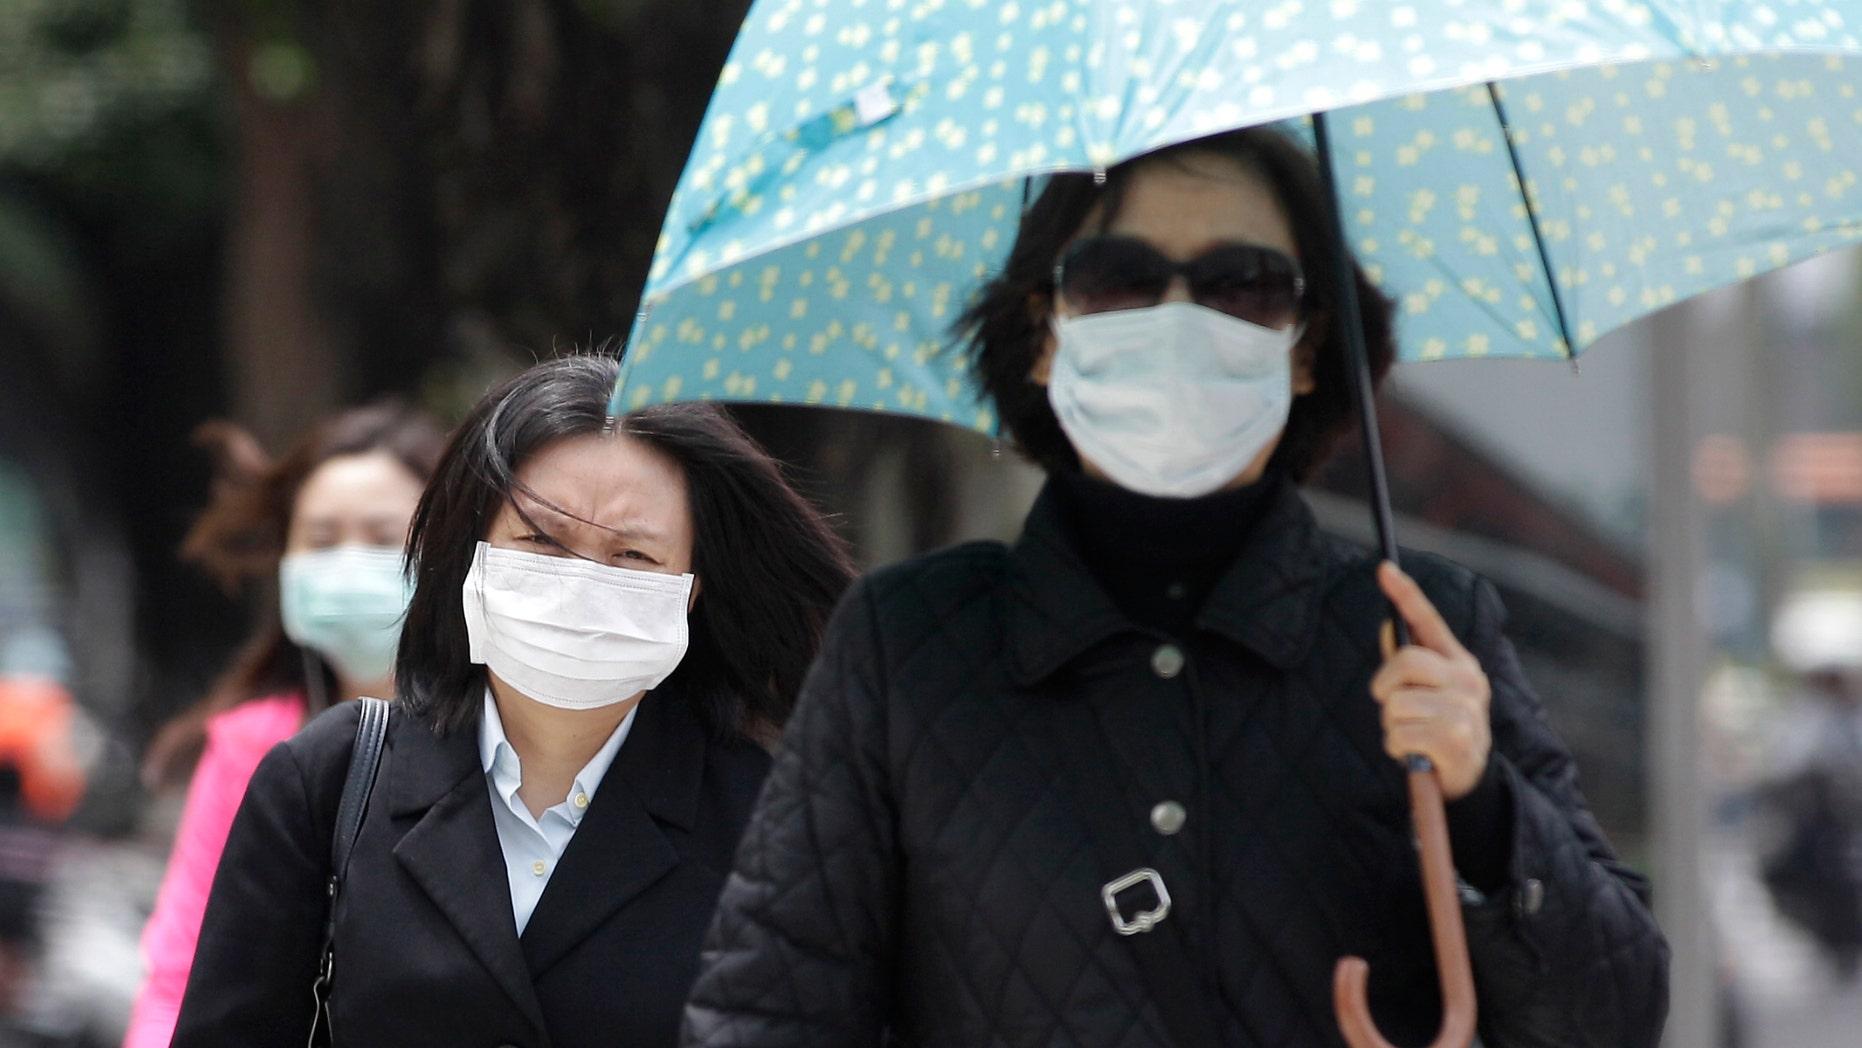 Pedestrians wearing medical masks walk on the street outside National Taiwan University Hospital in Taipei.